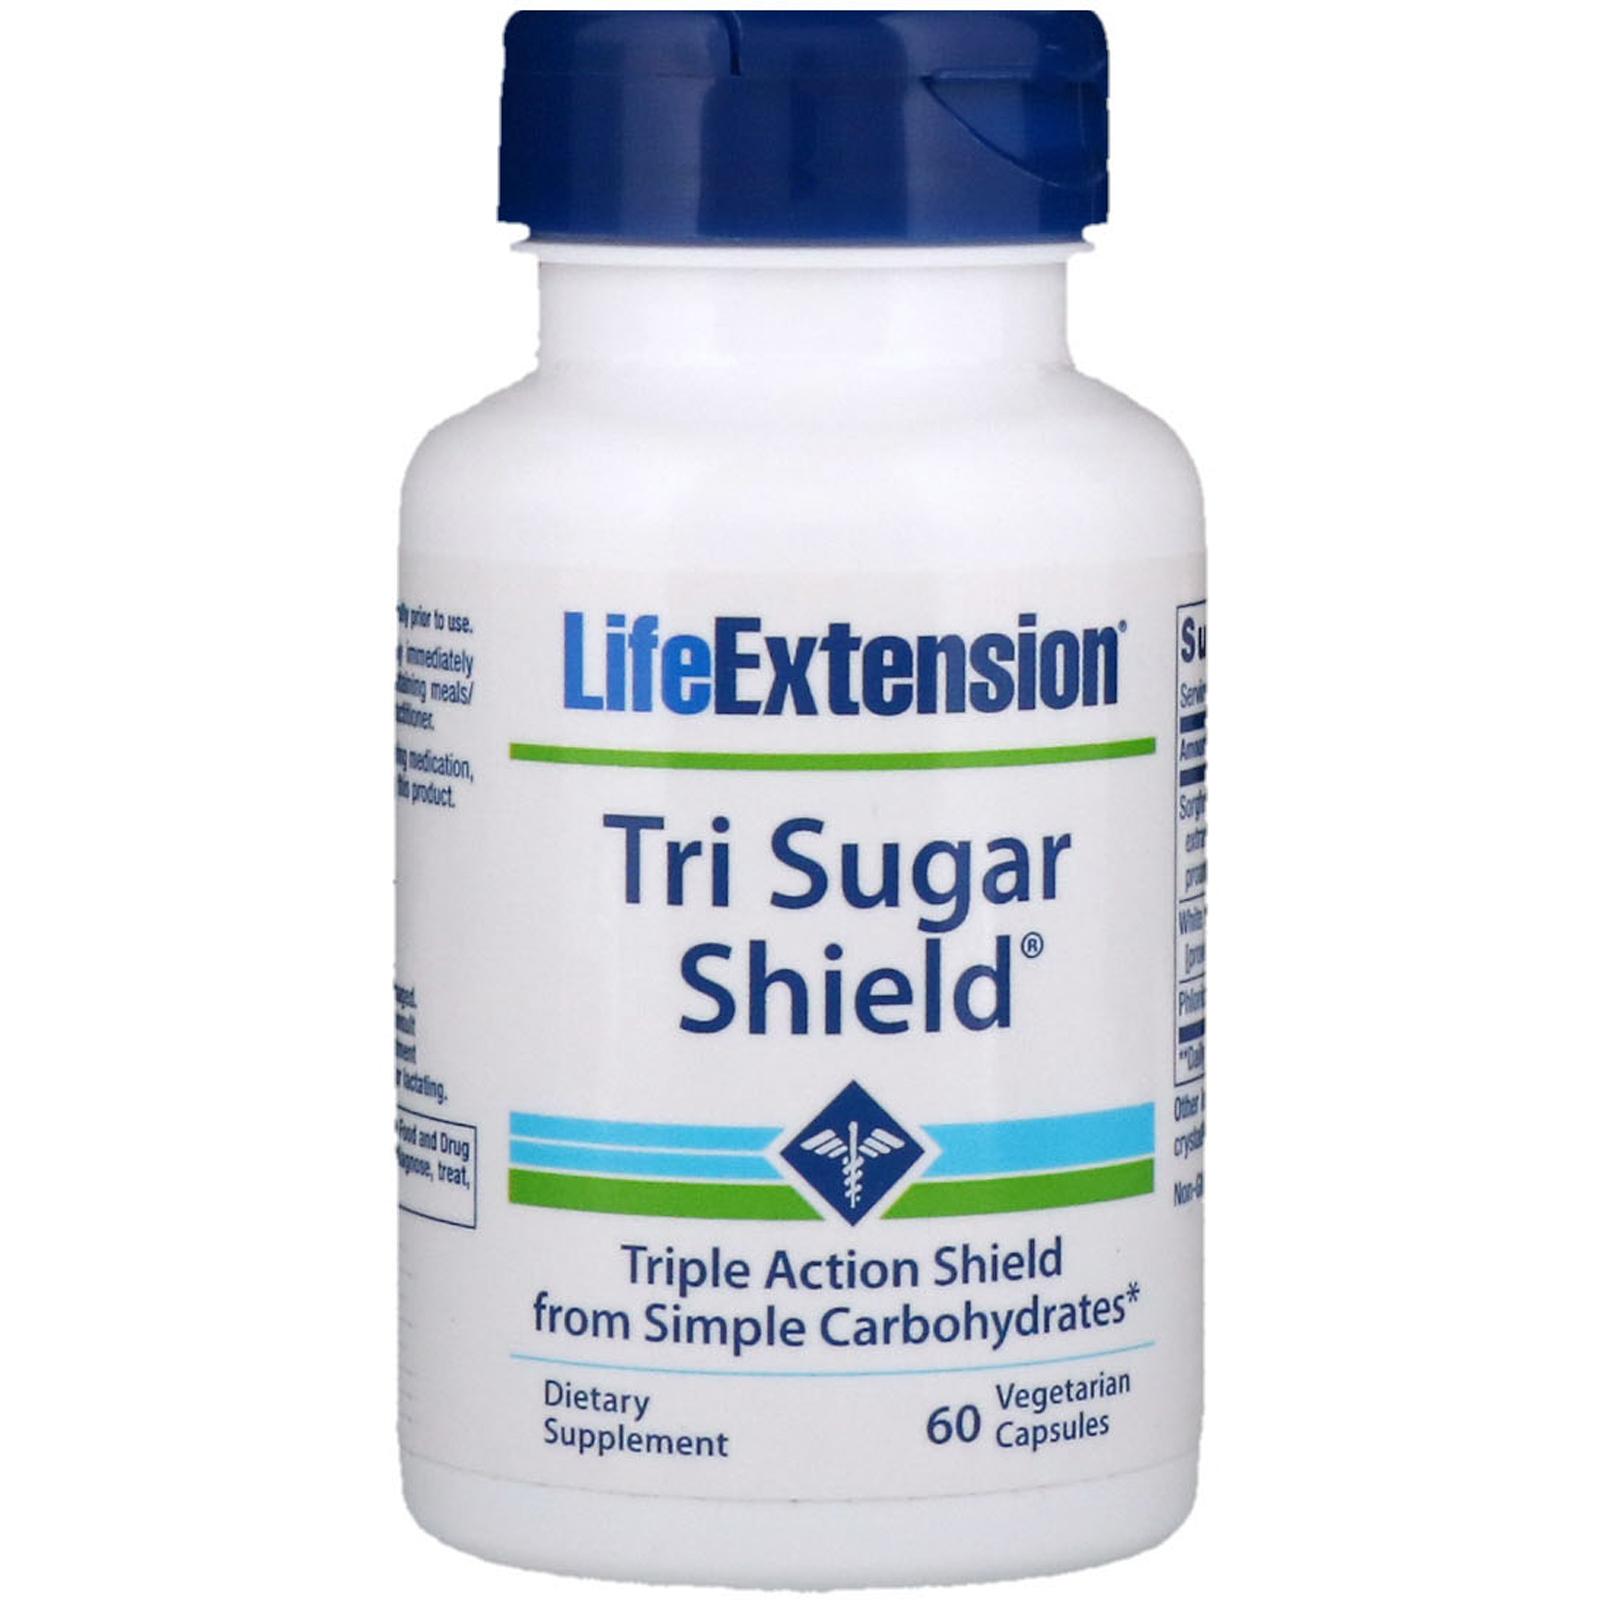 Life Extension, Tri Sugar Shield, 60 Vegetarian Capsules